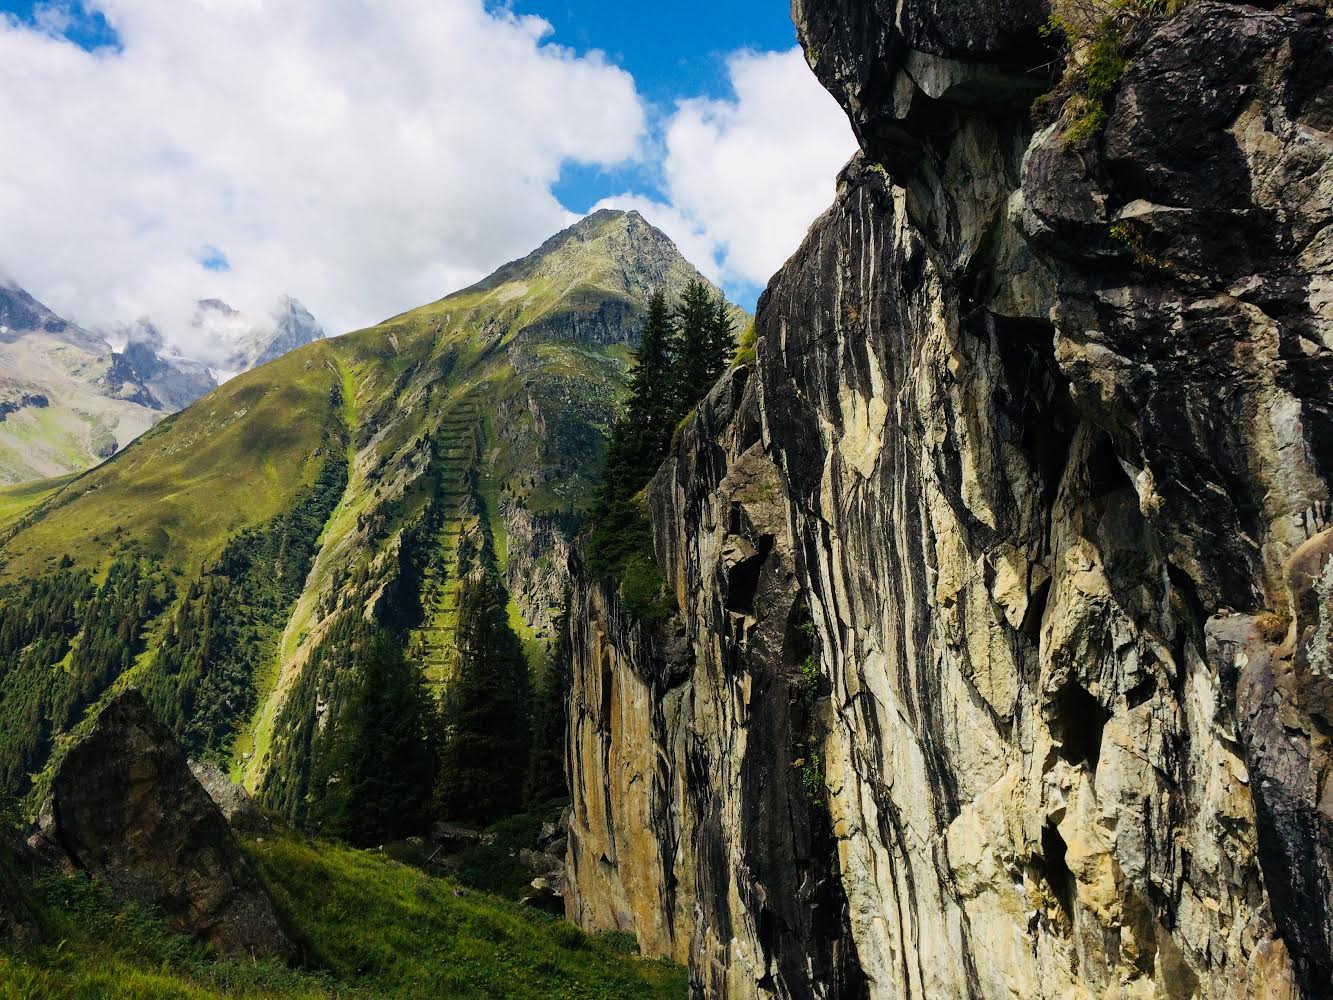 Ein Teil des Hexenkessels | Climbers Paradise